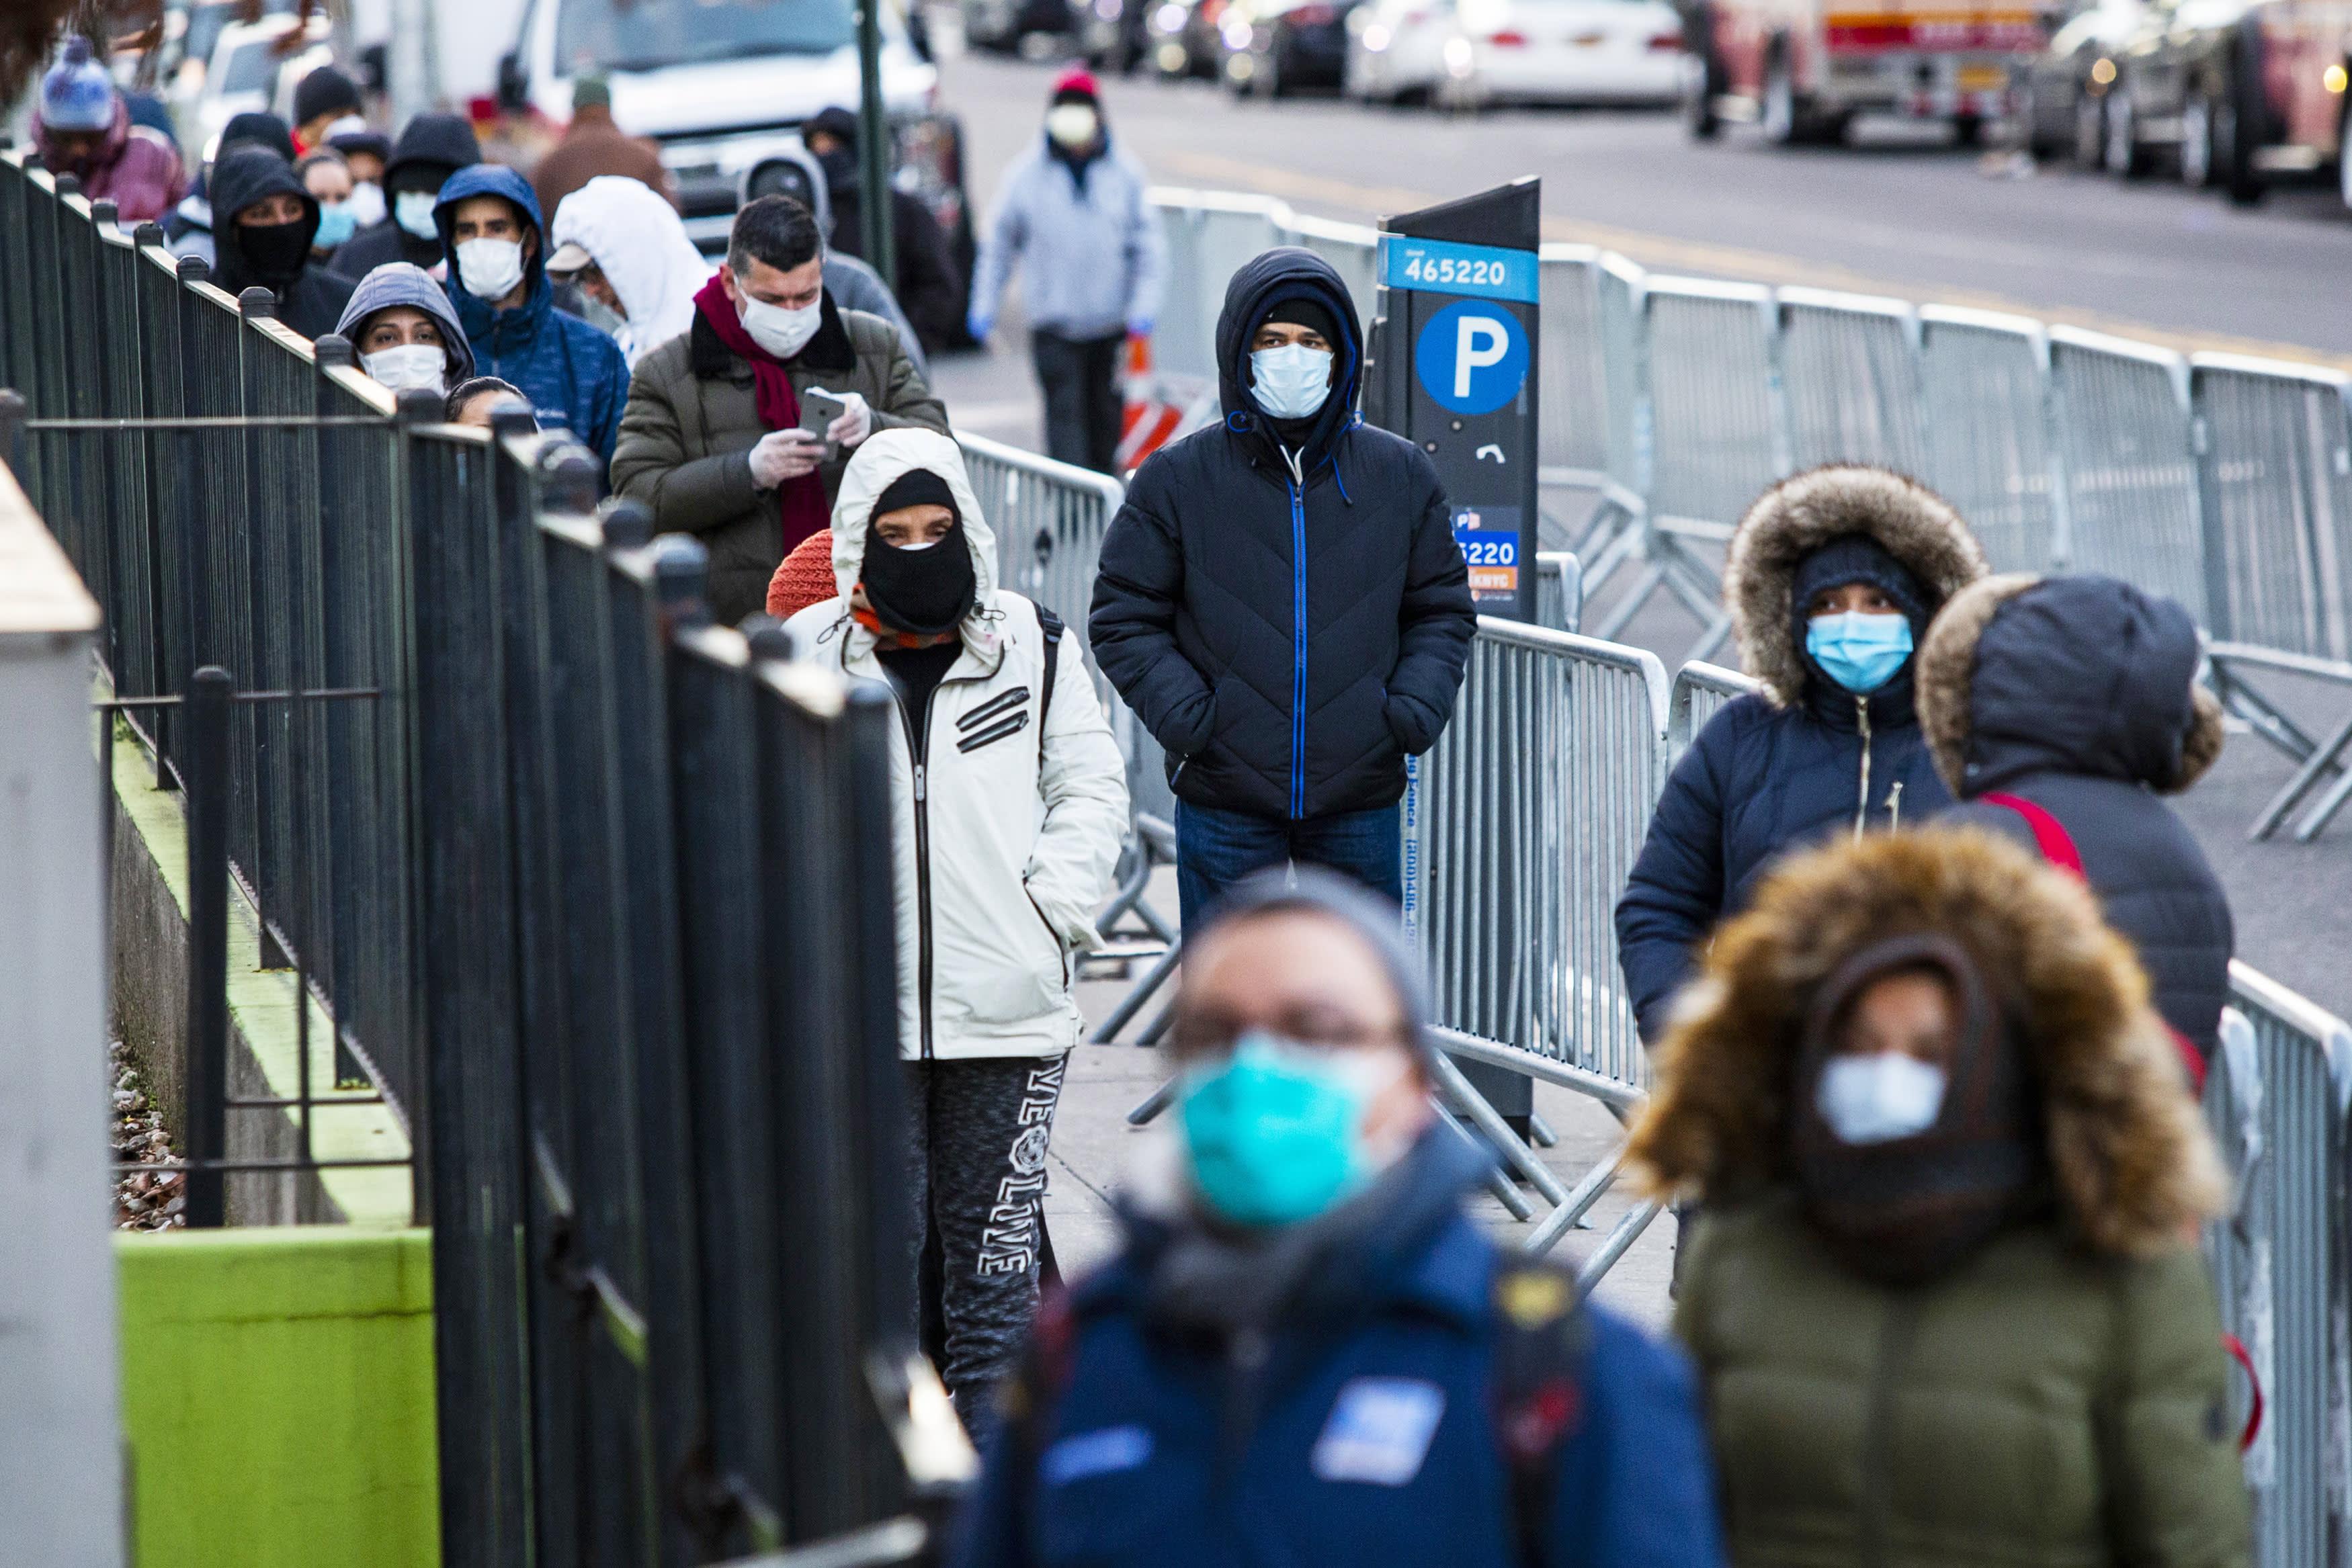 New York hospitals battle coronavirus as hundreds of patients flood in: 'We must not break'